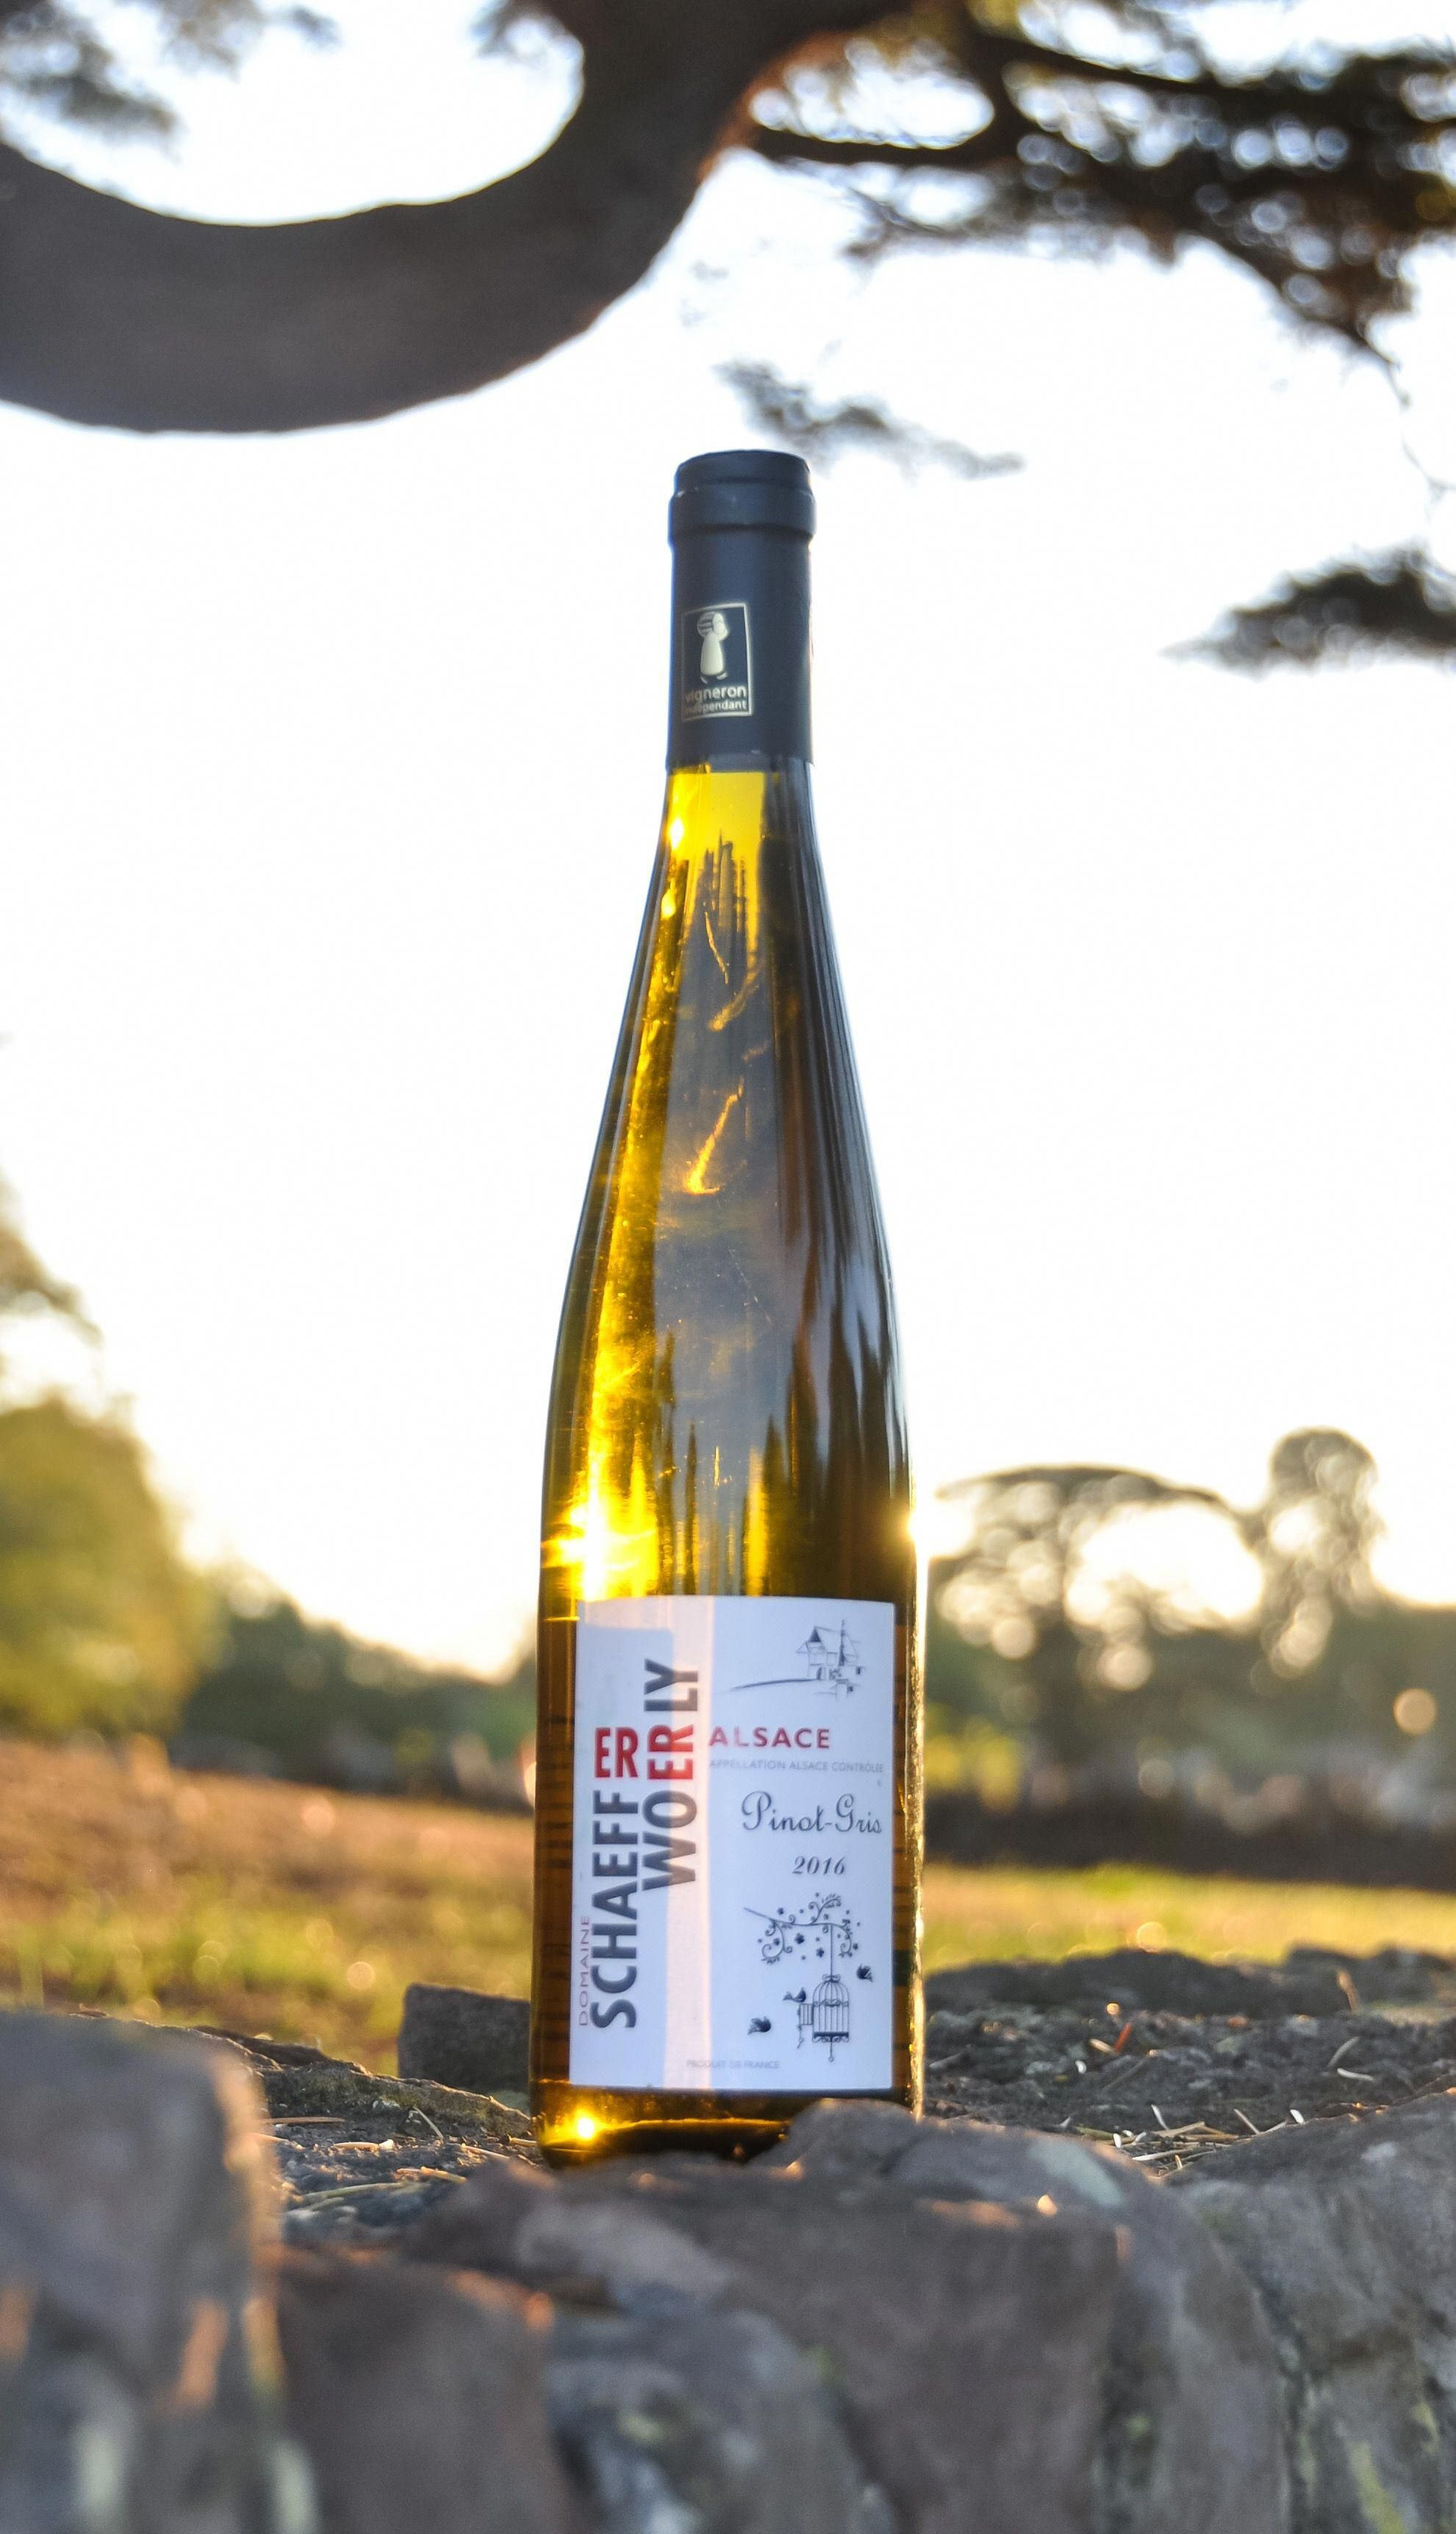 Pinot Gris Schaeffer Woerly Organic Vegan Bristol Winelover Lovewine Pinotgris White Wine Schaeffer Woerly Vinbio Delici Wine Pinot Gris Vegan Wine